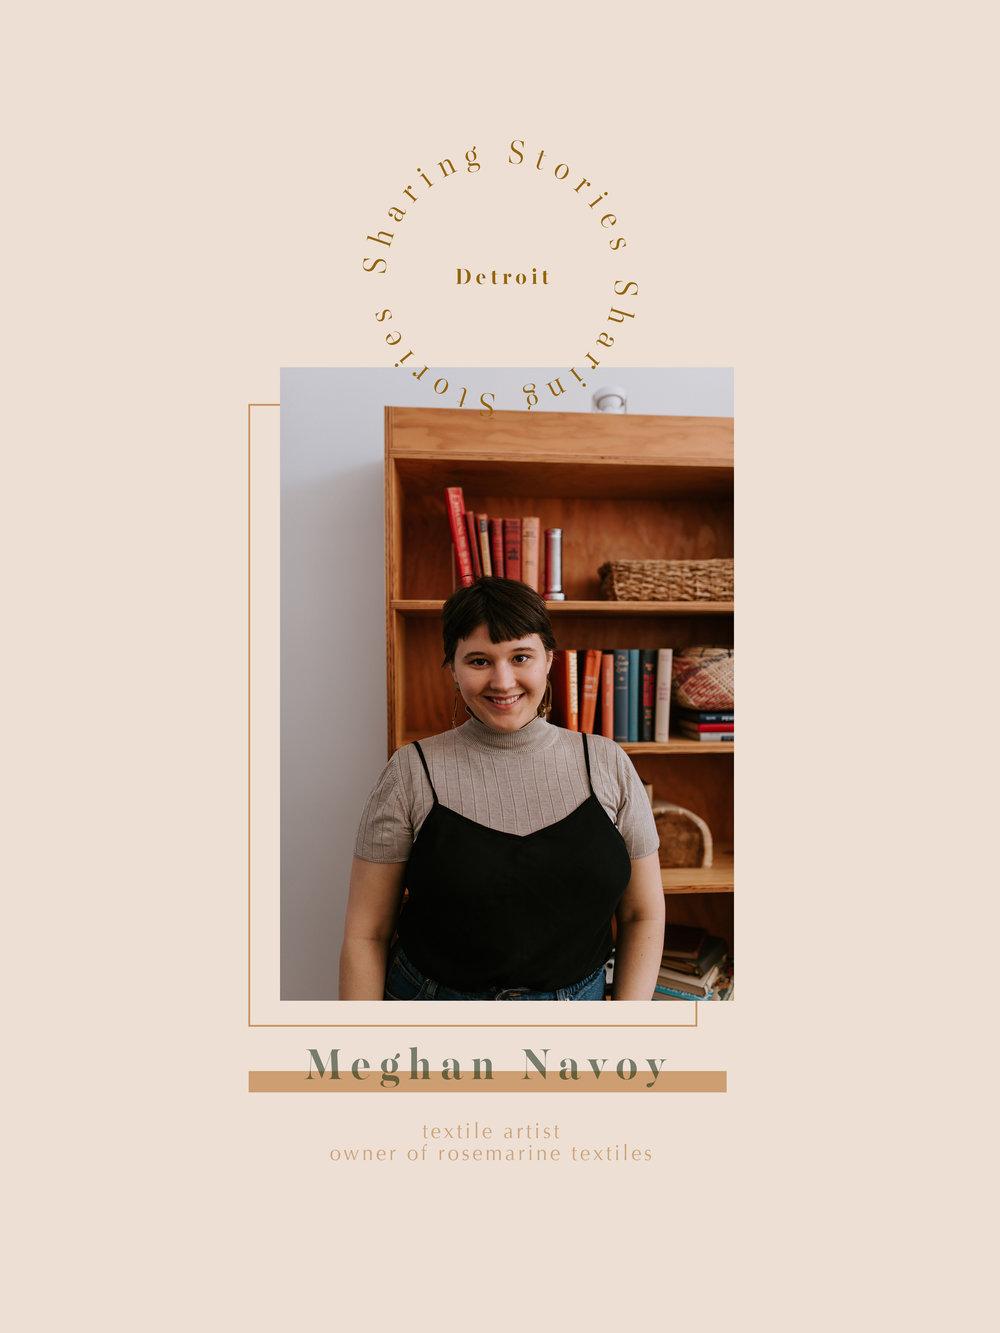 Meghan Navoy (me) owner of Rosemarine Textiles - textile artist and biz lady extrordinaire ;)